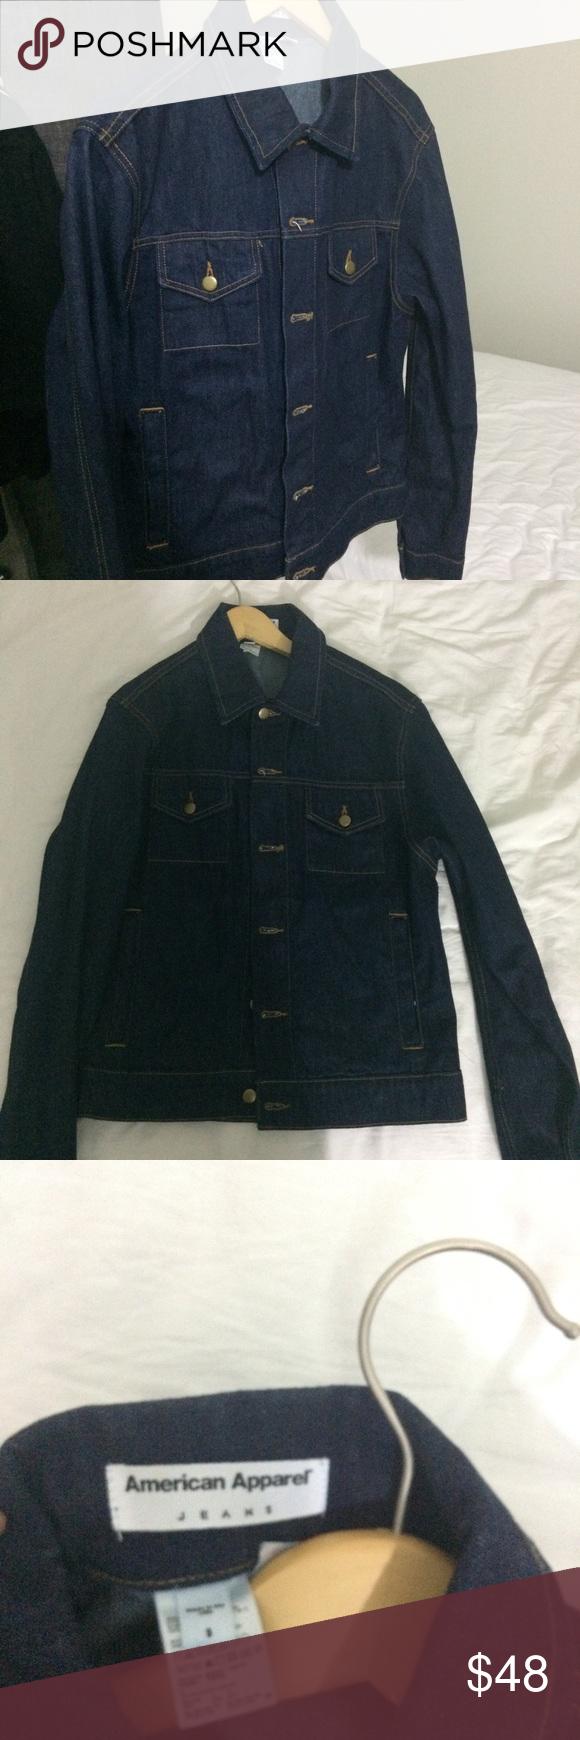 AA Jacket